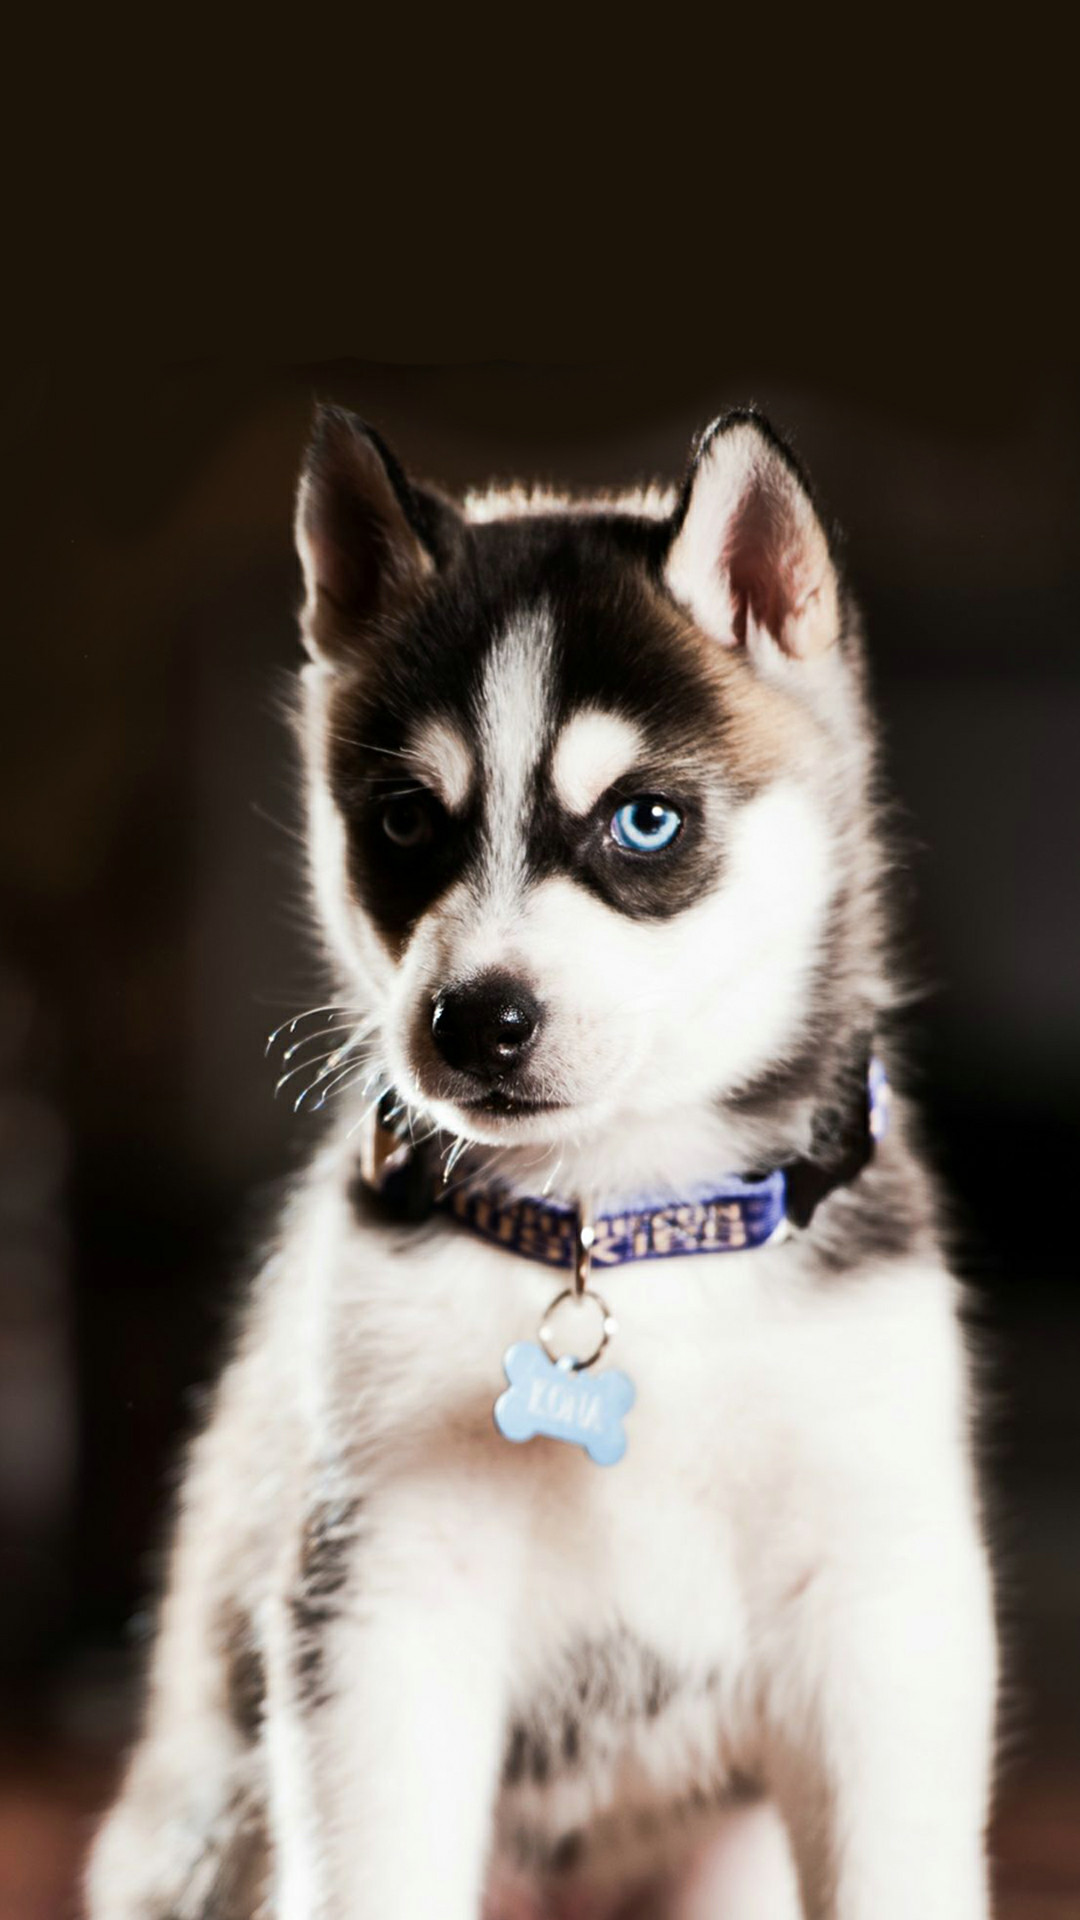 #wallpaper #homescreen #lockscreen #cute #dog Follow me find more cute dog